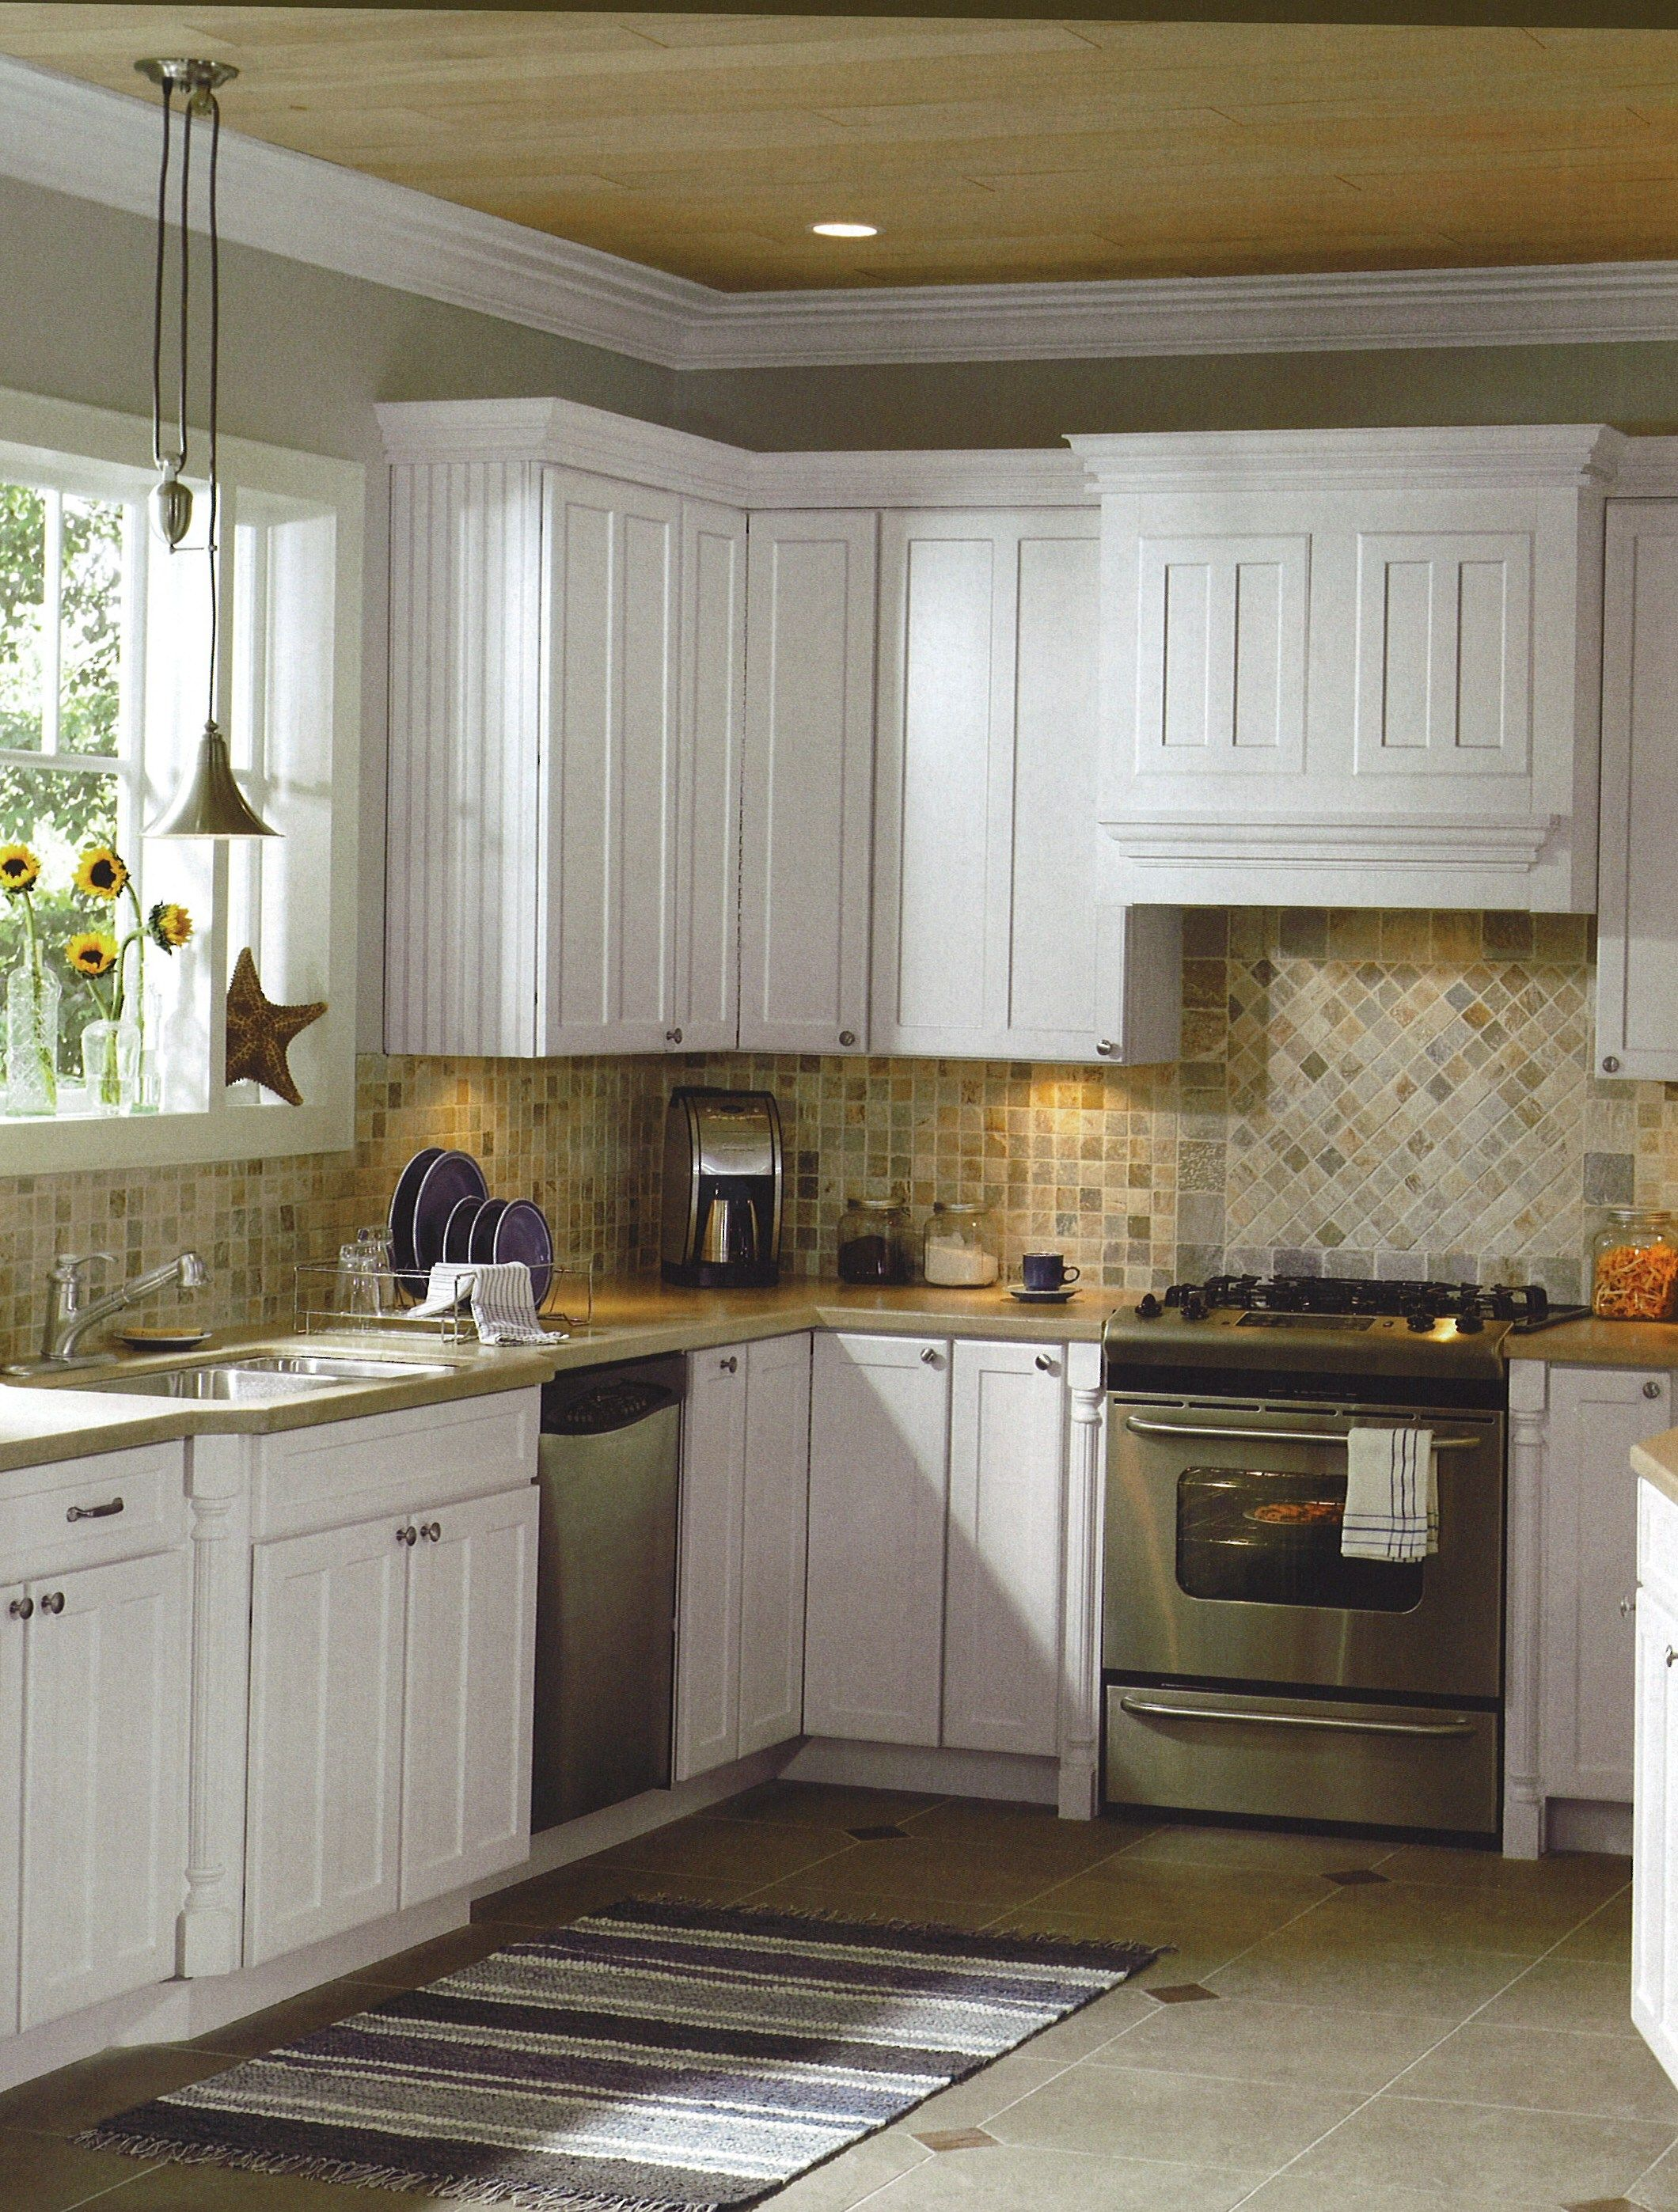 country kitchen design idea kitchen mycyfi white cabinets grey